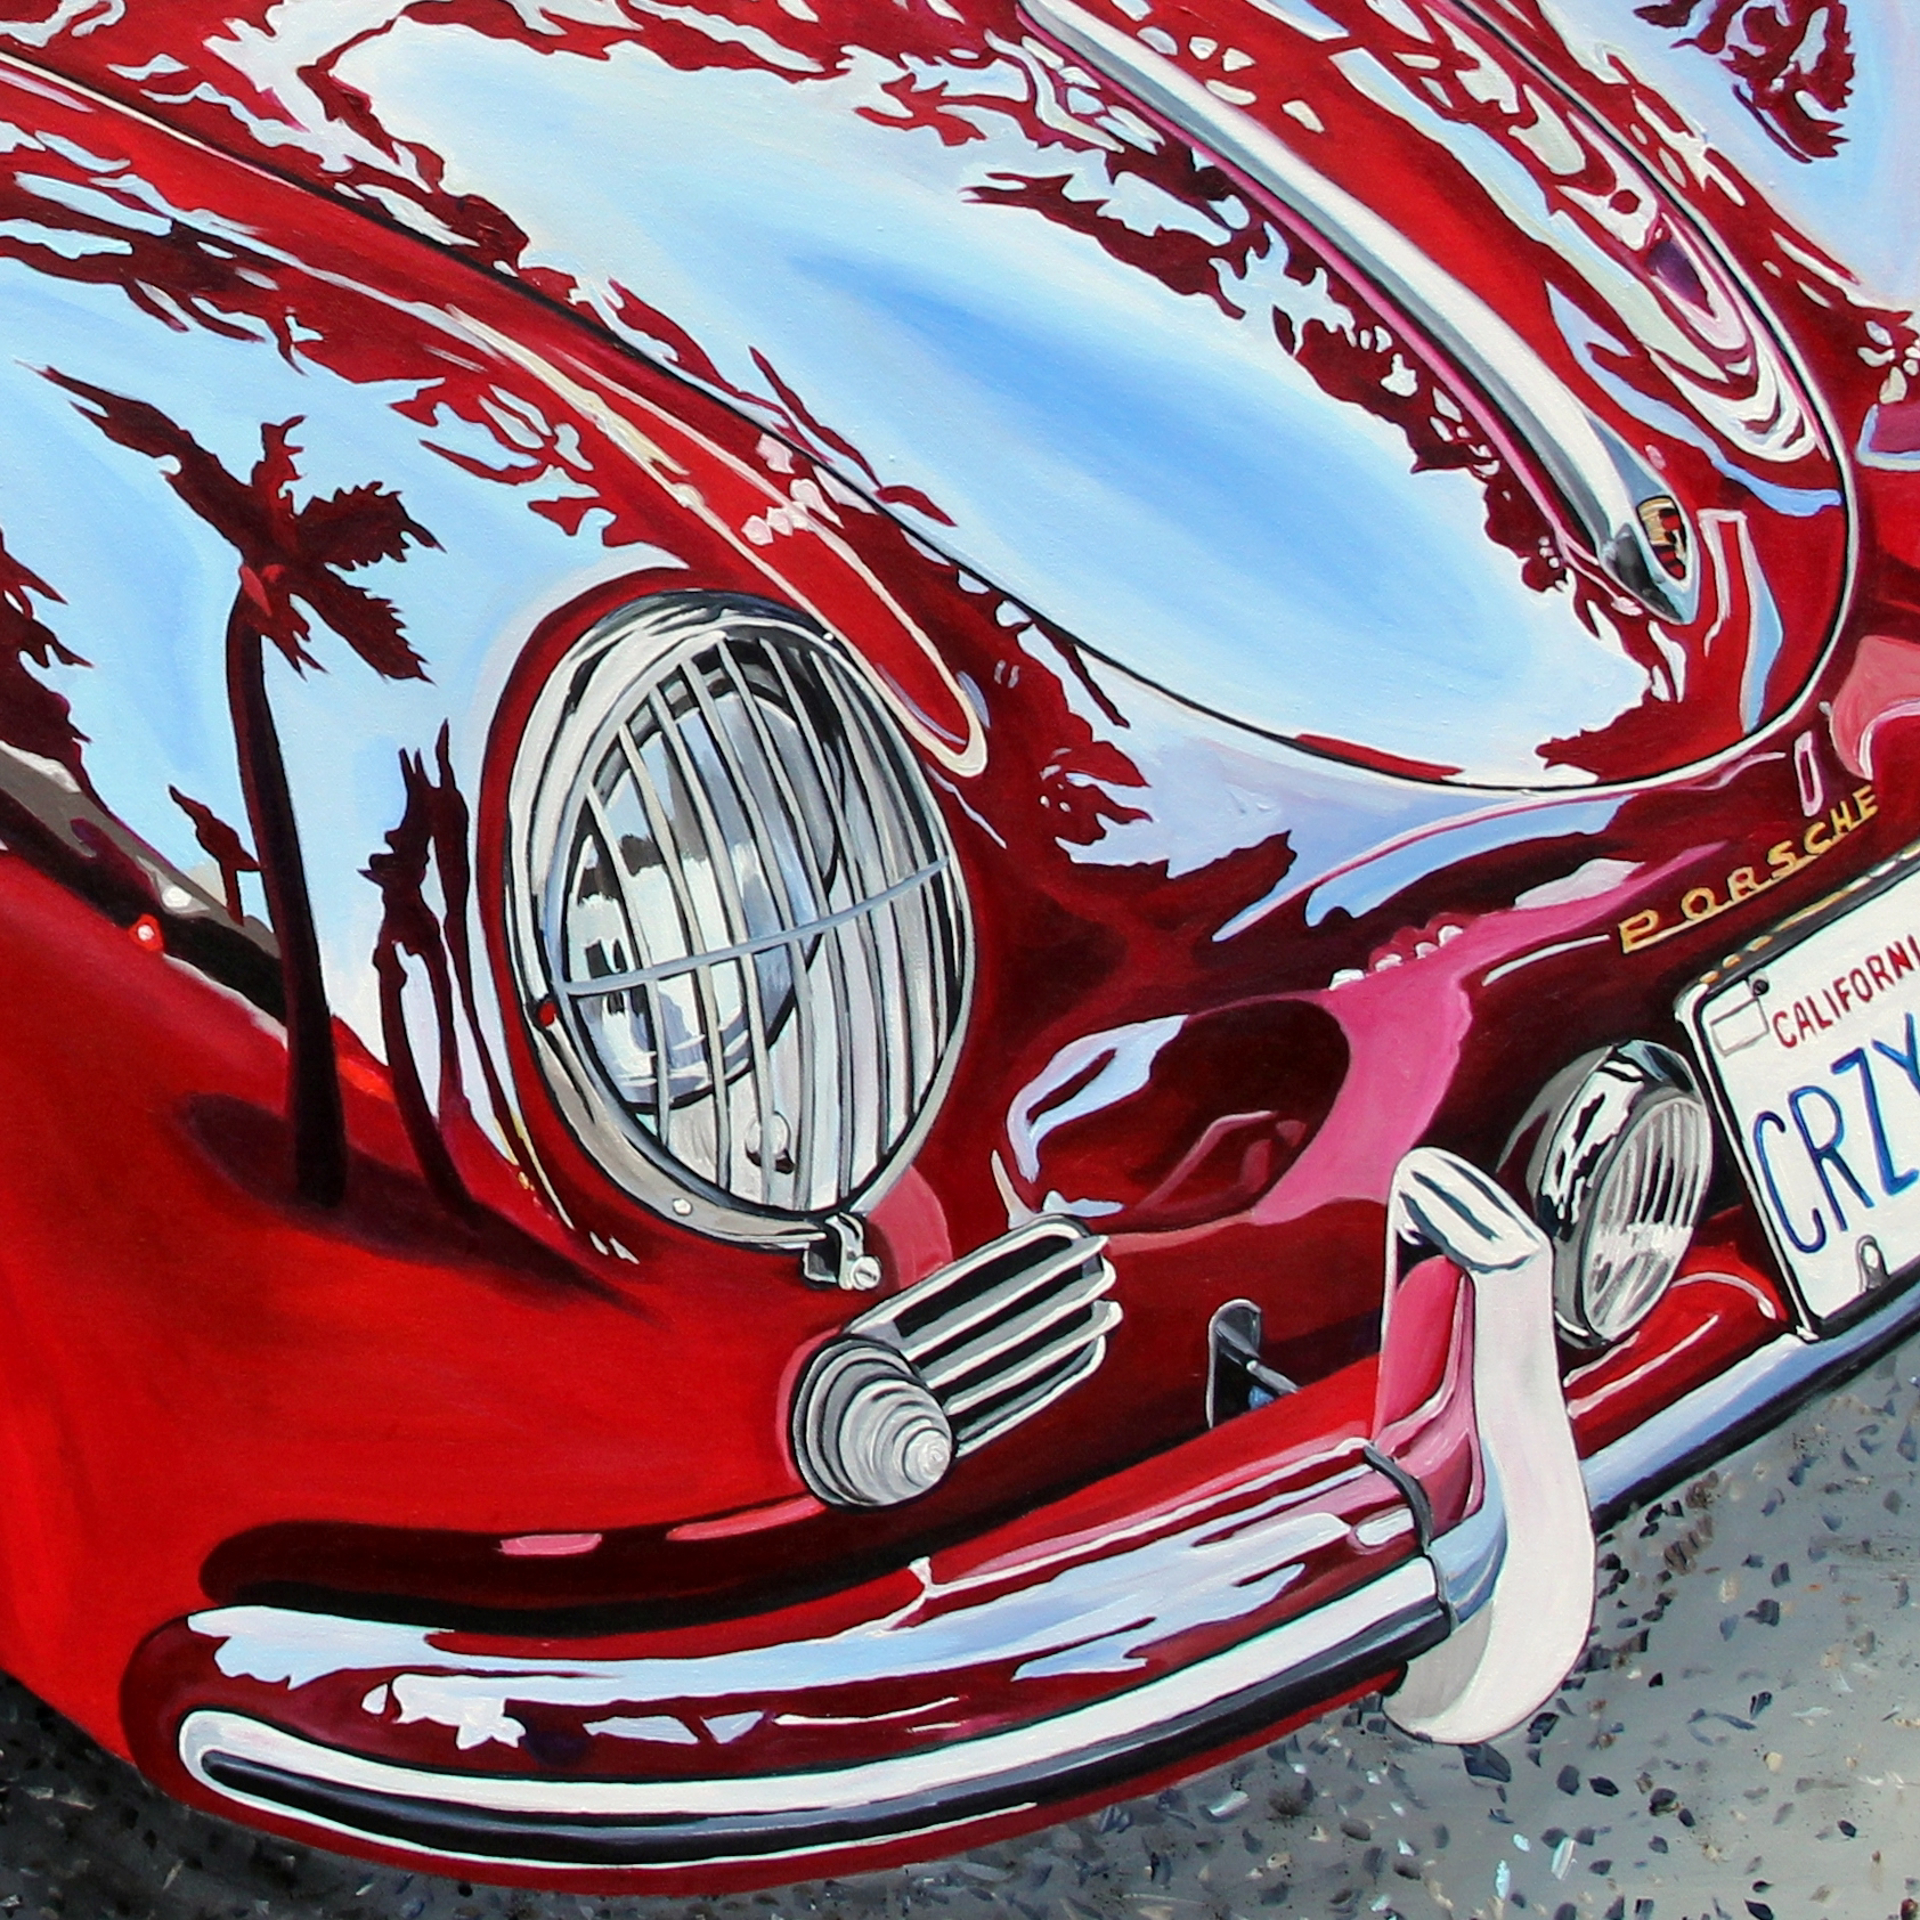 Late '50s Porsche 356 by Taralee Guild